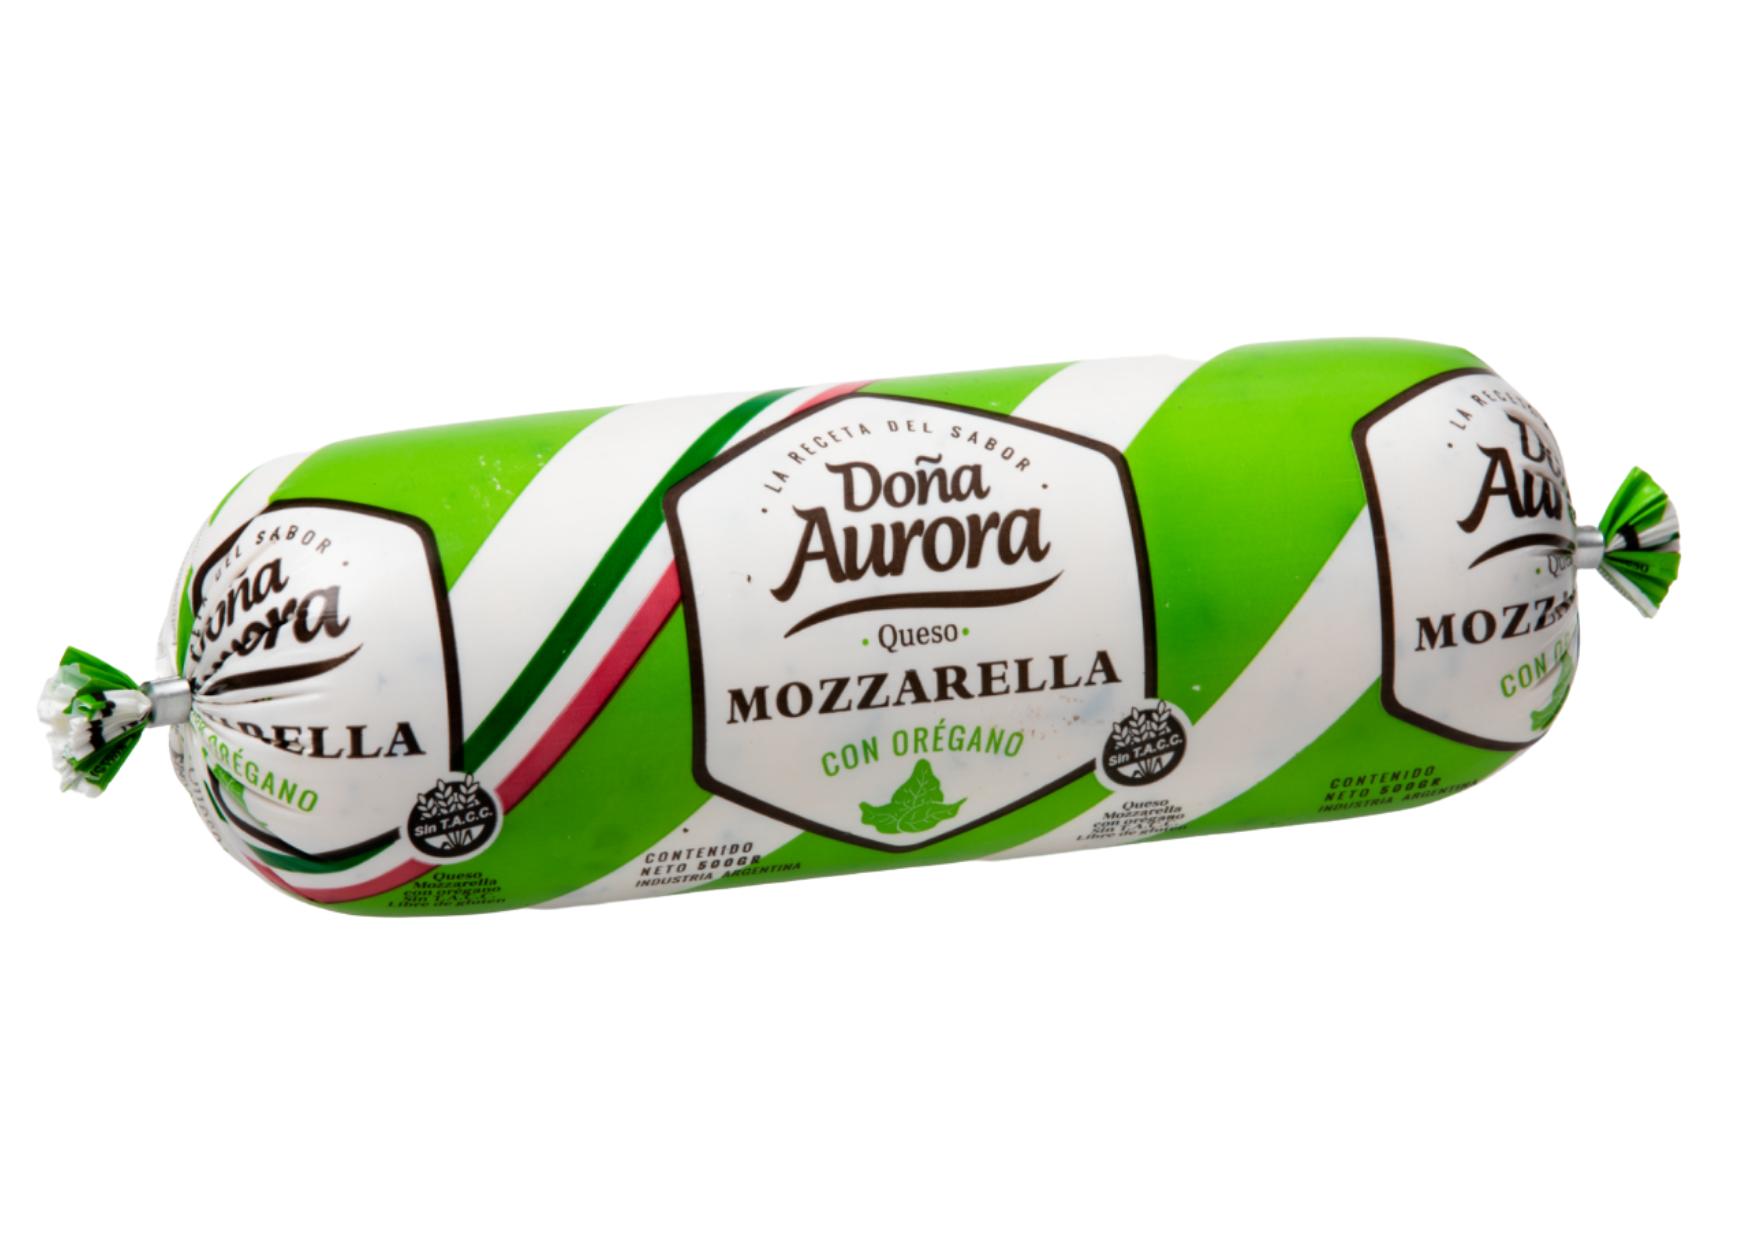 Doña Aurora Oregano Mozzarella Cheese by Lácteos Aurora 500g